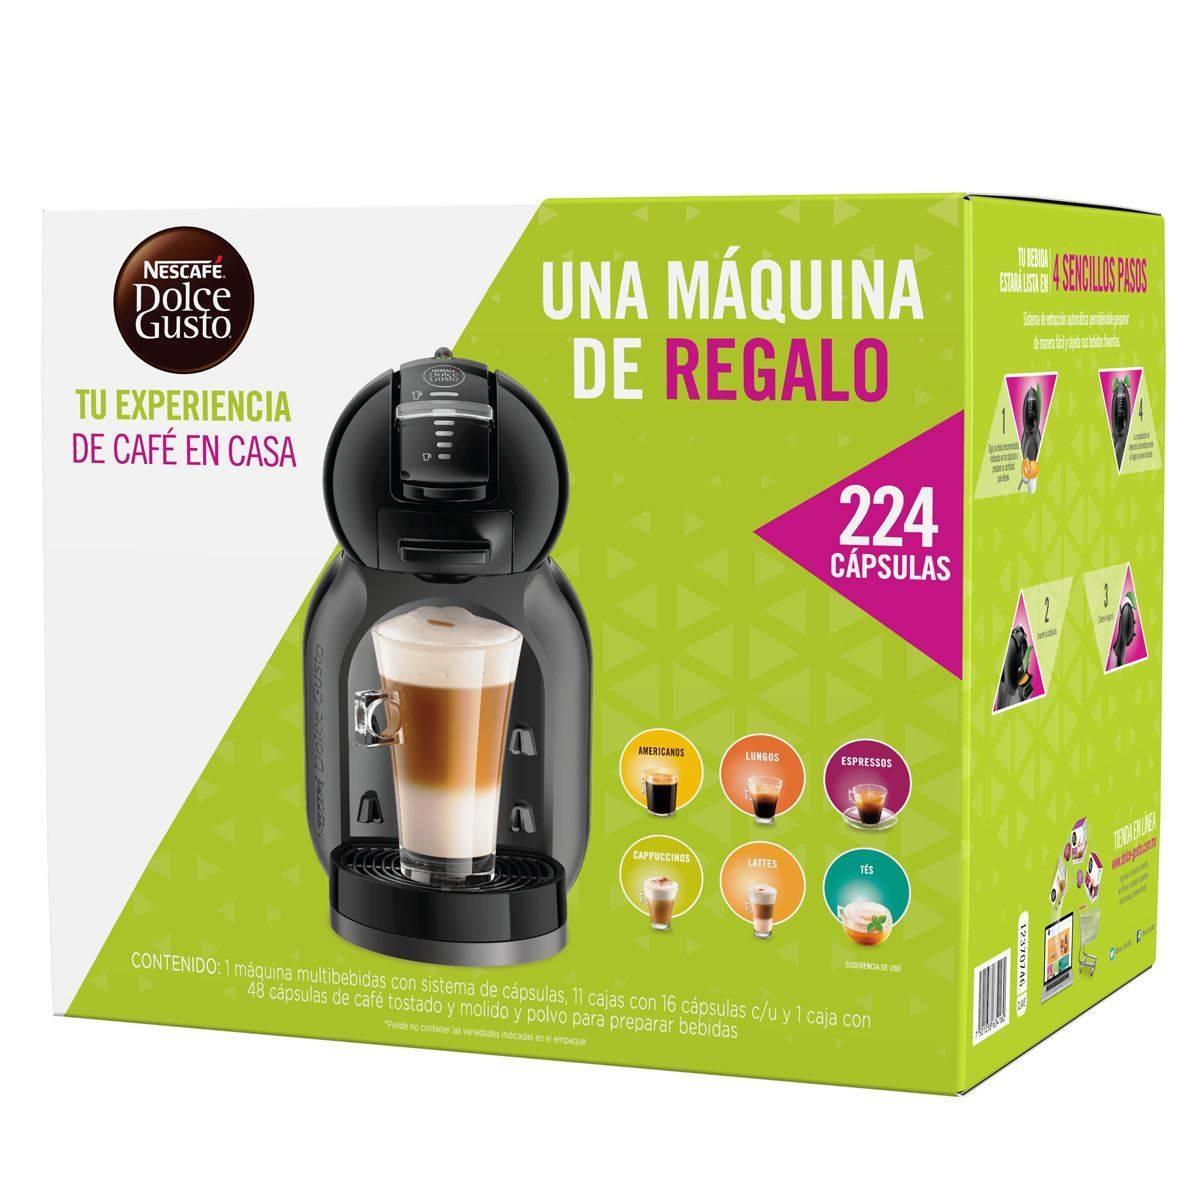 Claro Shop: Cafetera Minime dolce gusto + 224 capsulas